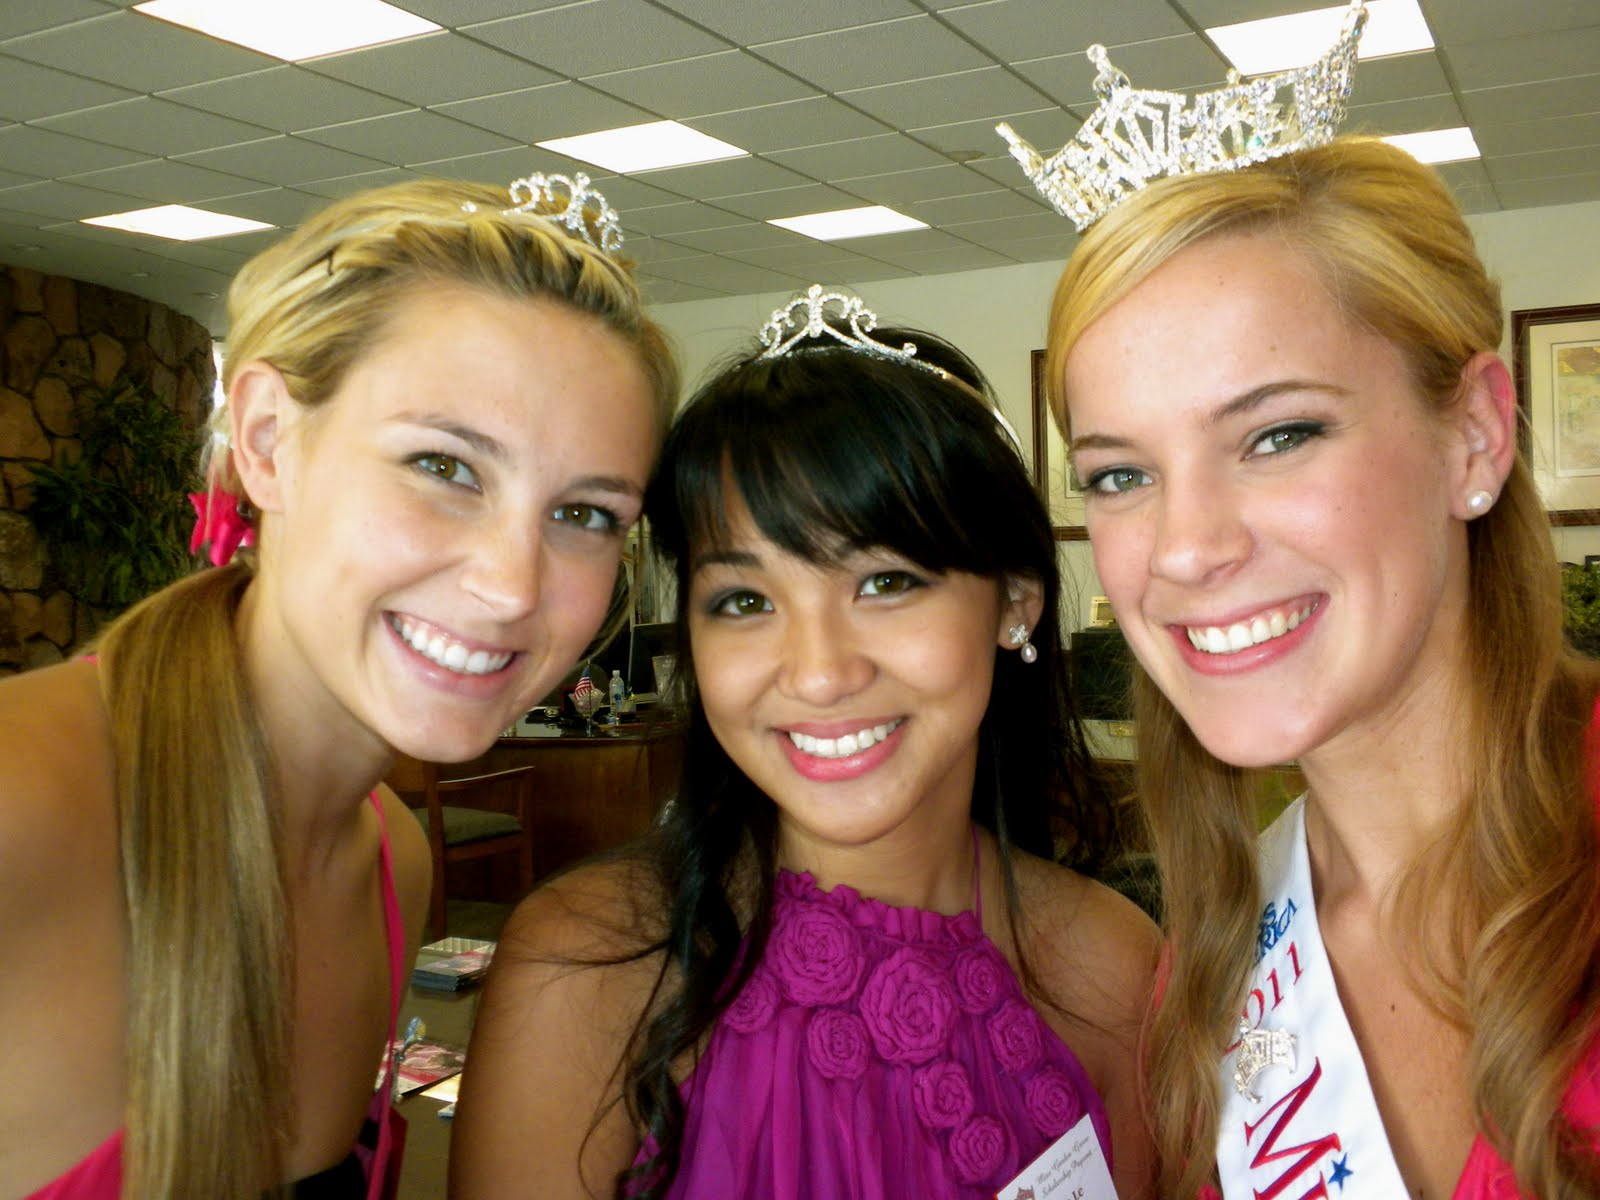 Miss Garden Grove 2011: September 2010